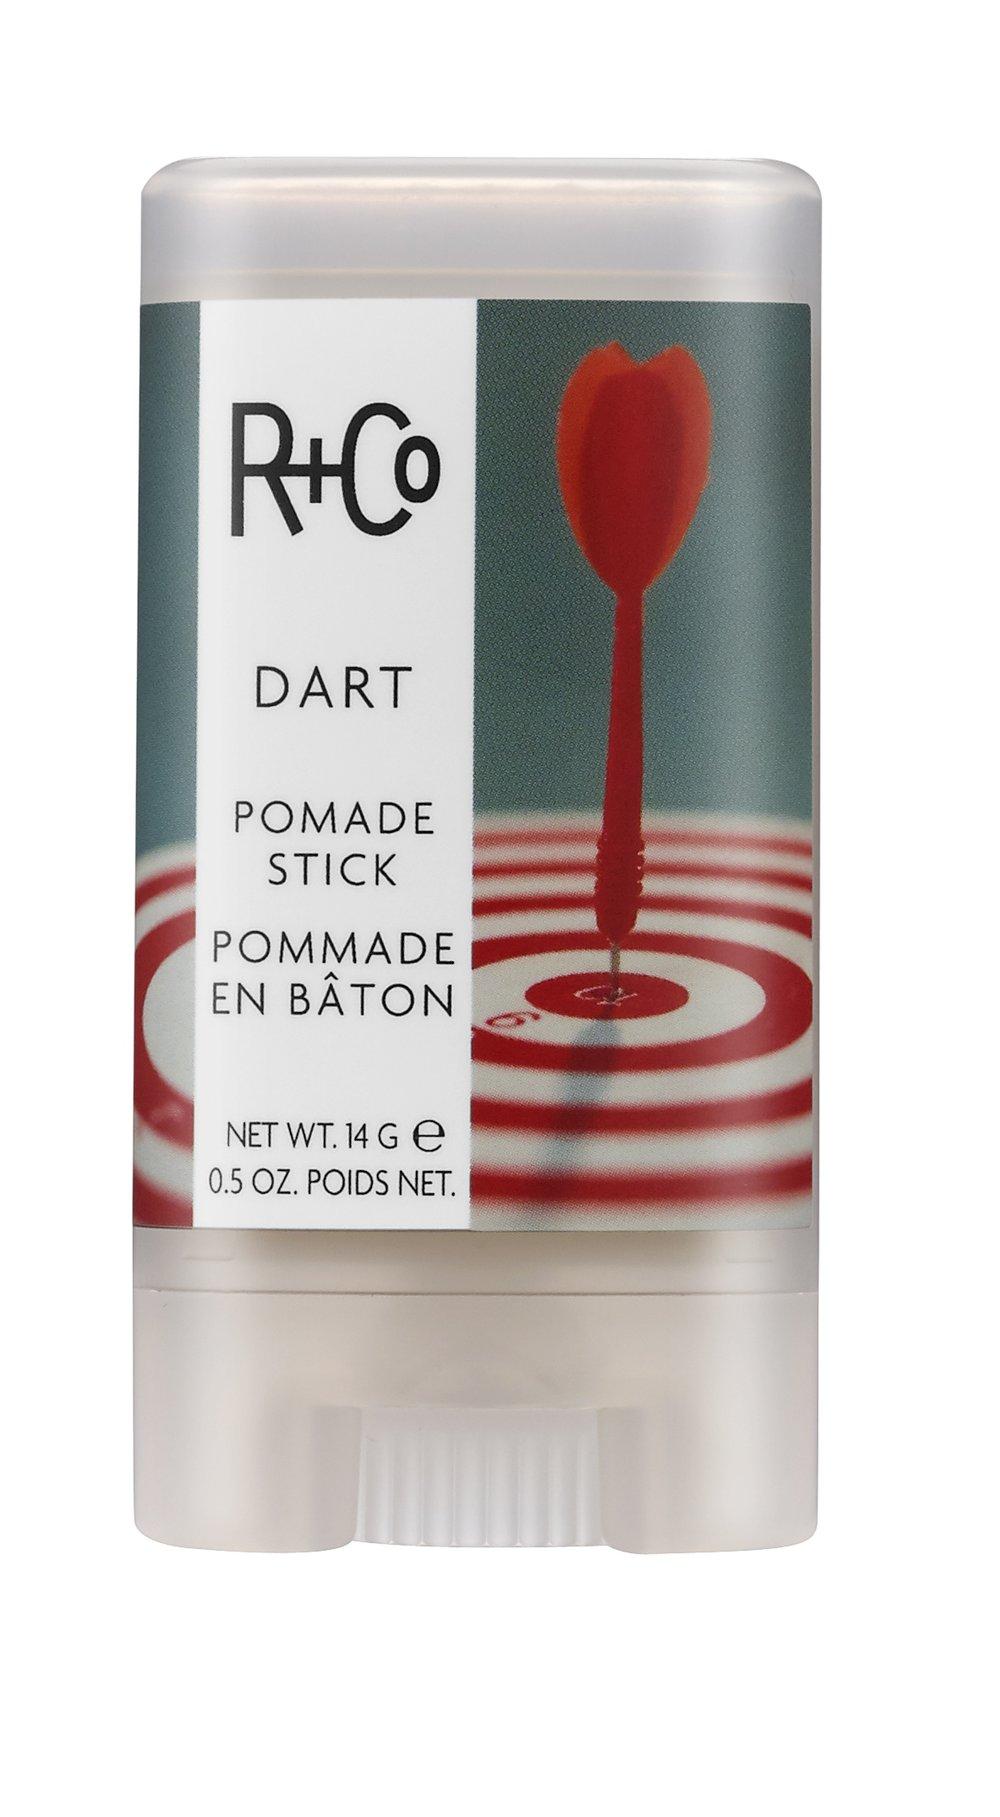 Dart Pomade Stick ($19)